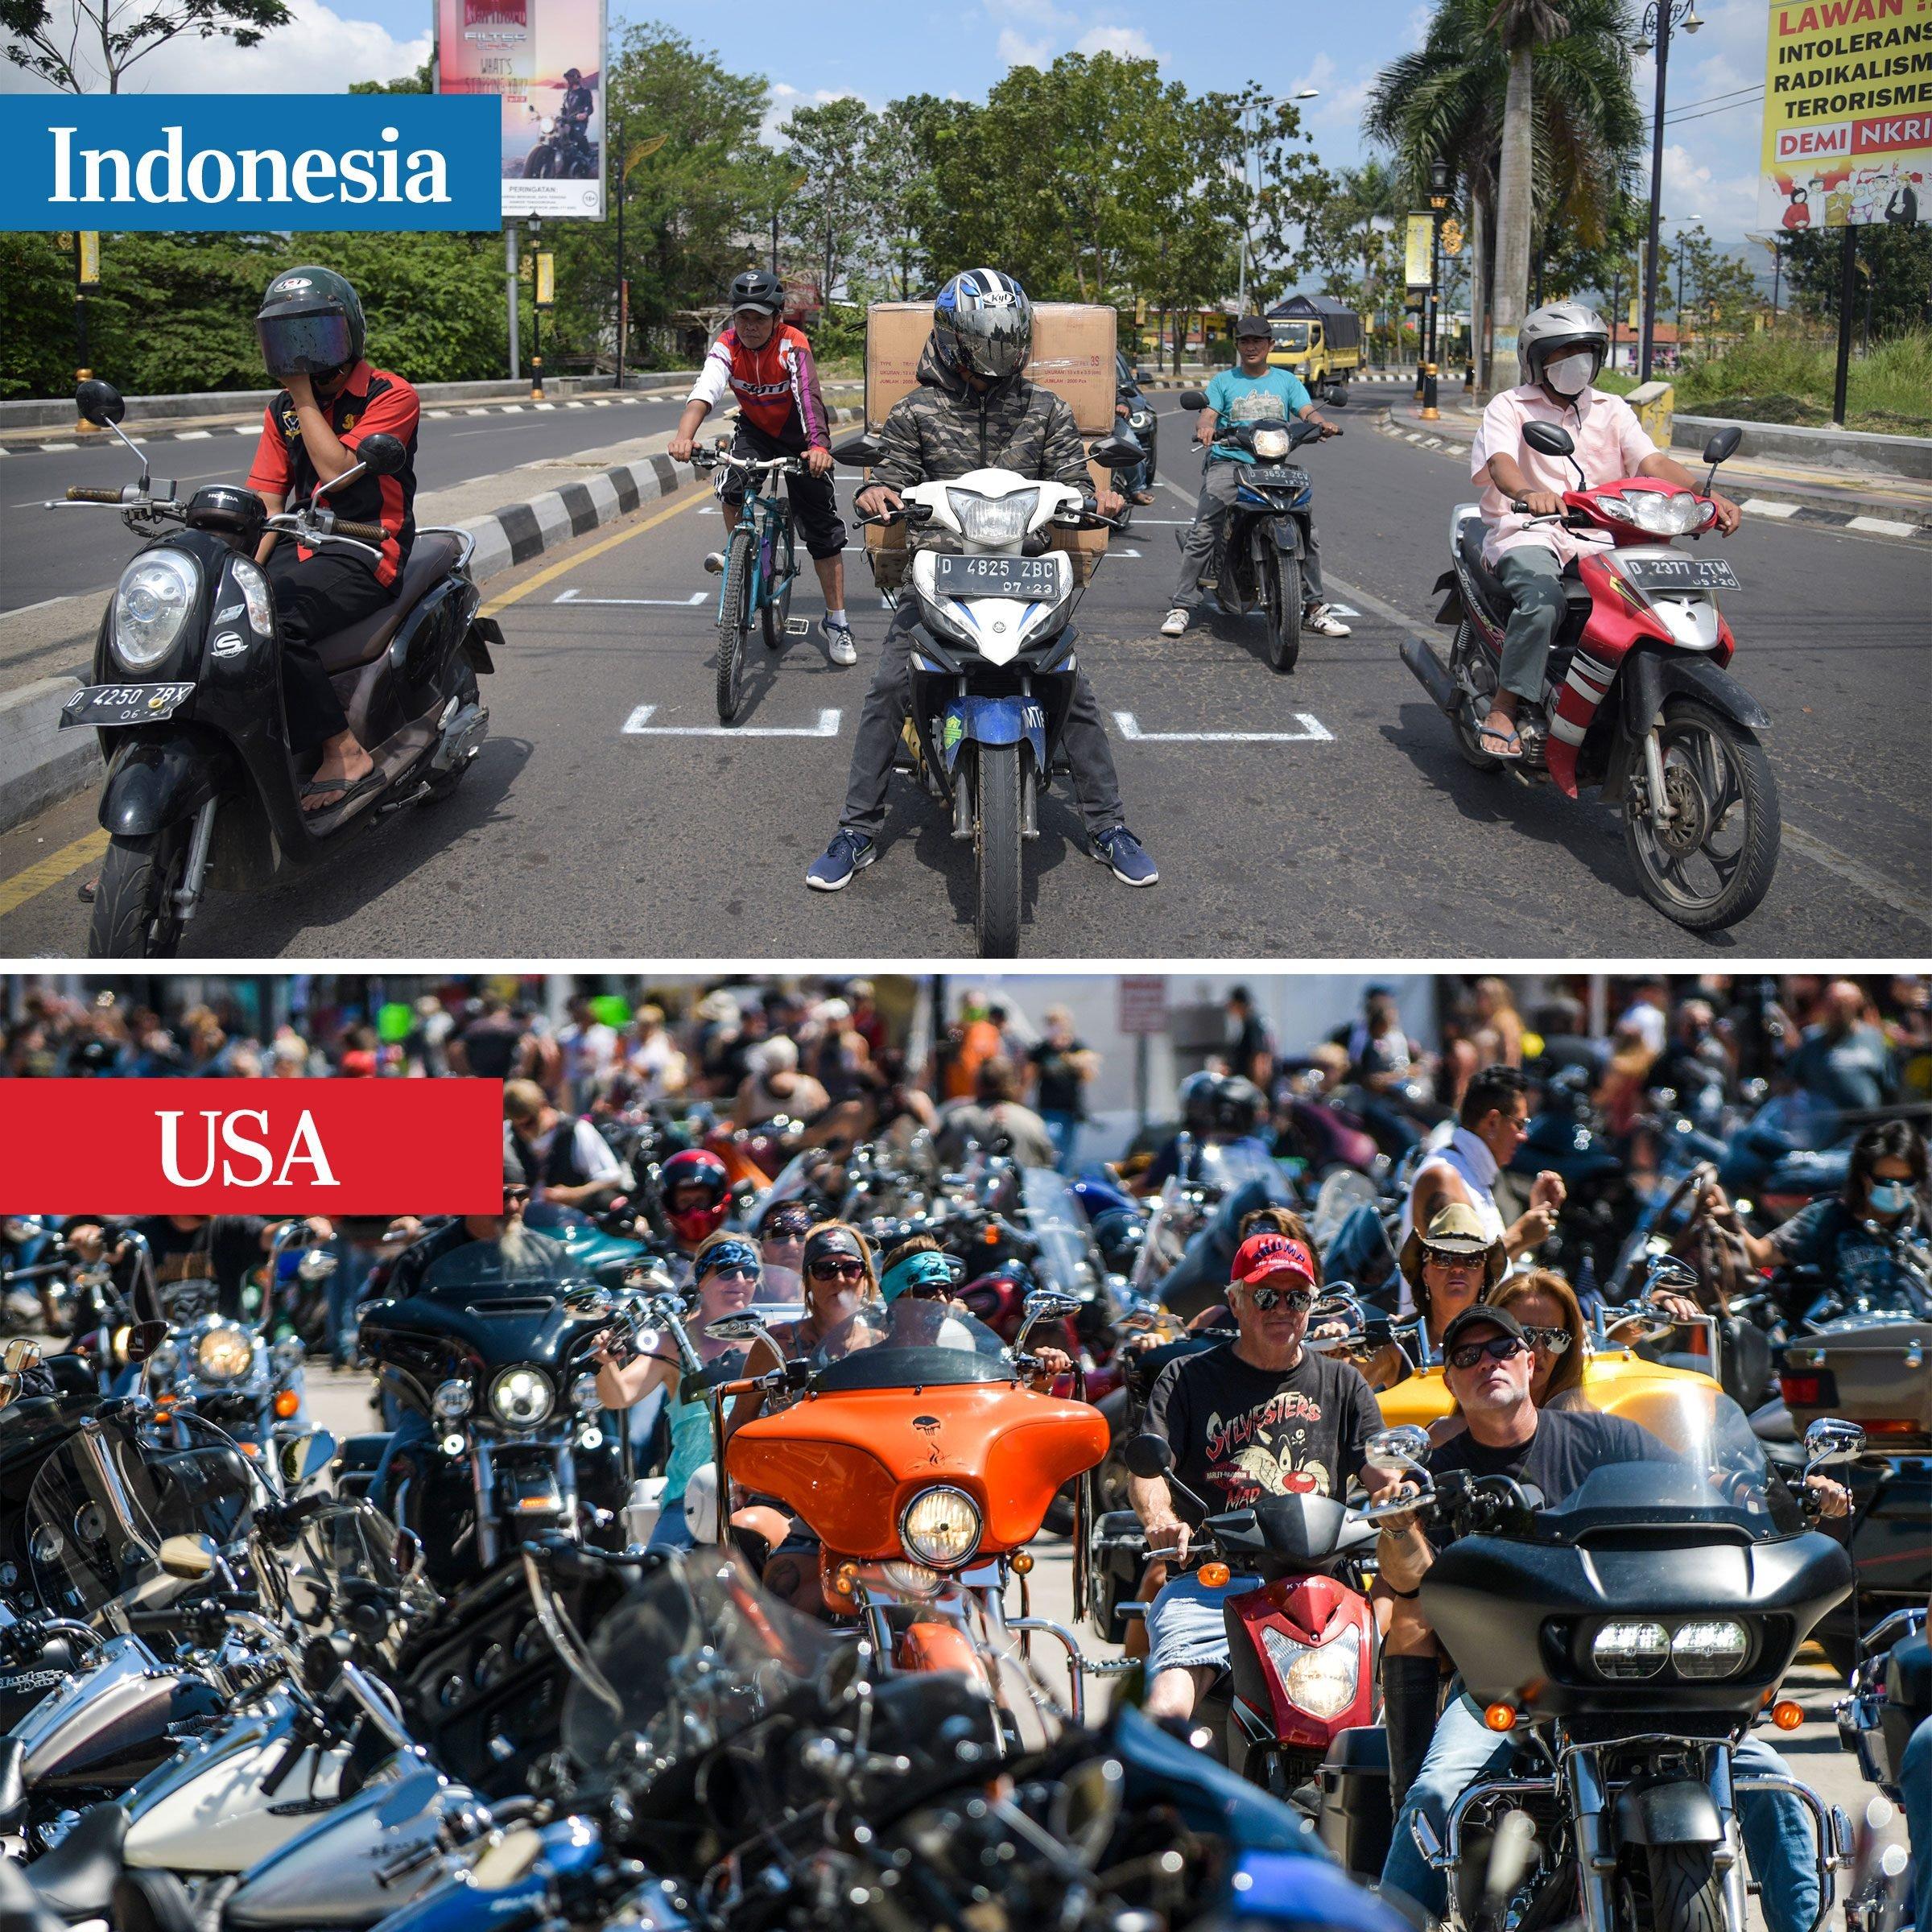 indonesia vs usa - motorcyclists